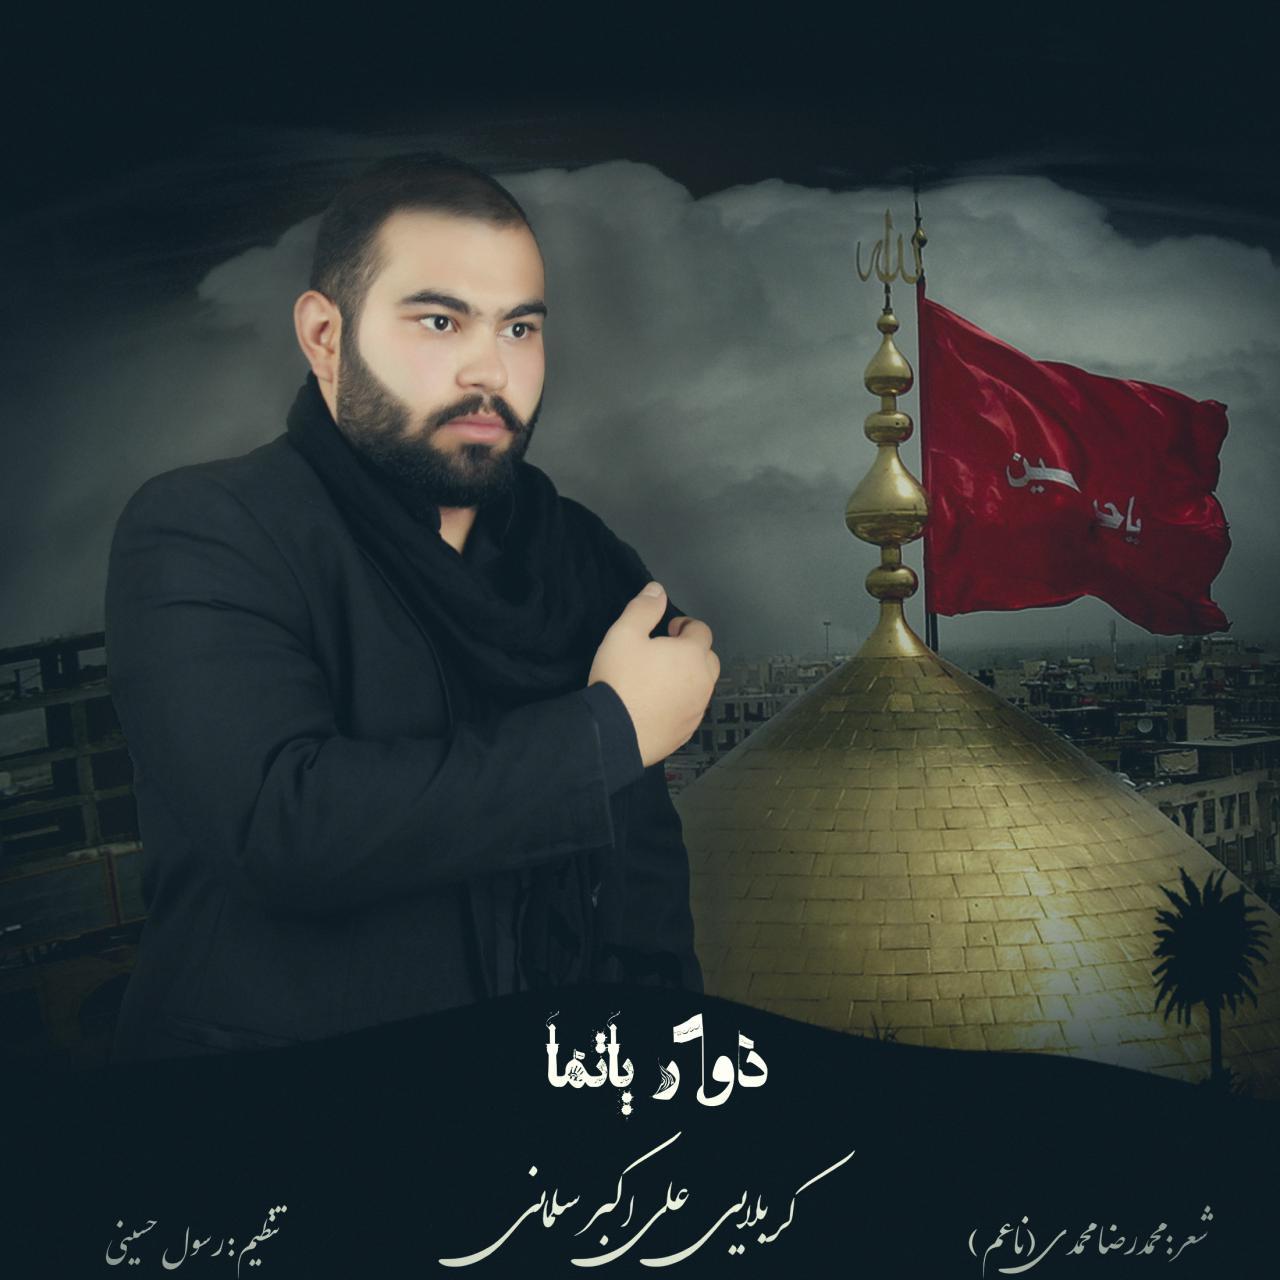 http://s7.picofile.com/file/8375651518/04Ali_Akbar_Salmani_Dur_Yatma.jpg